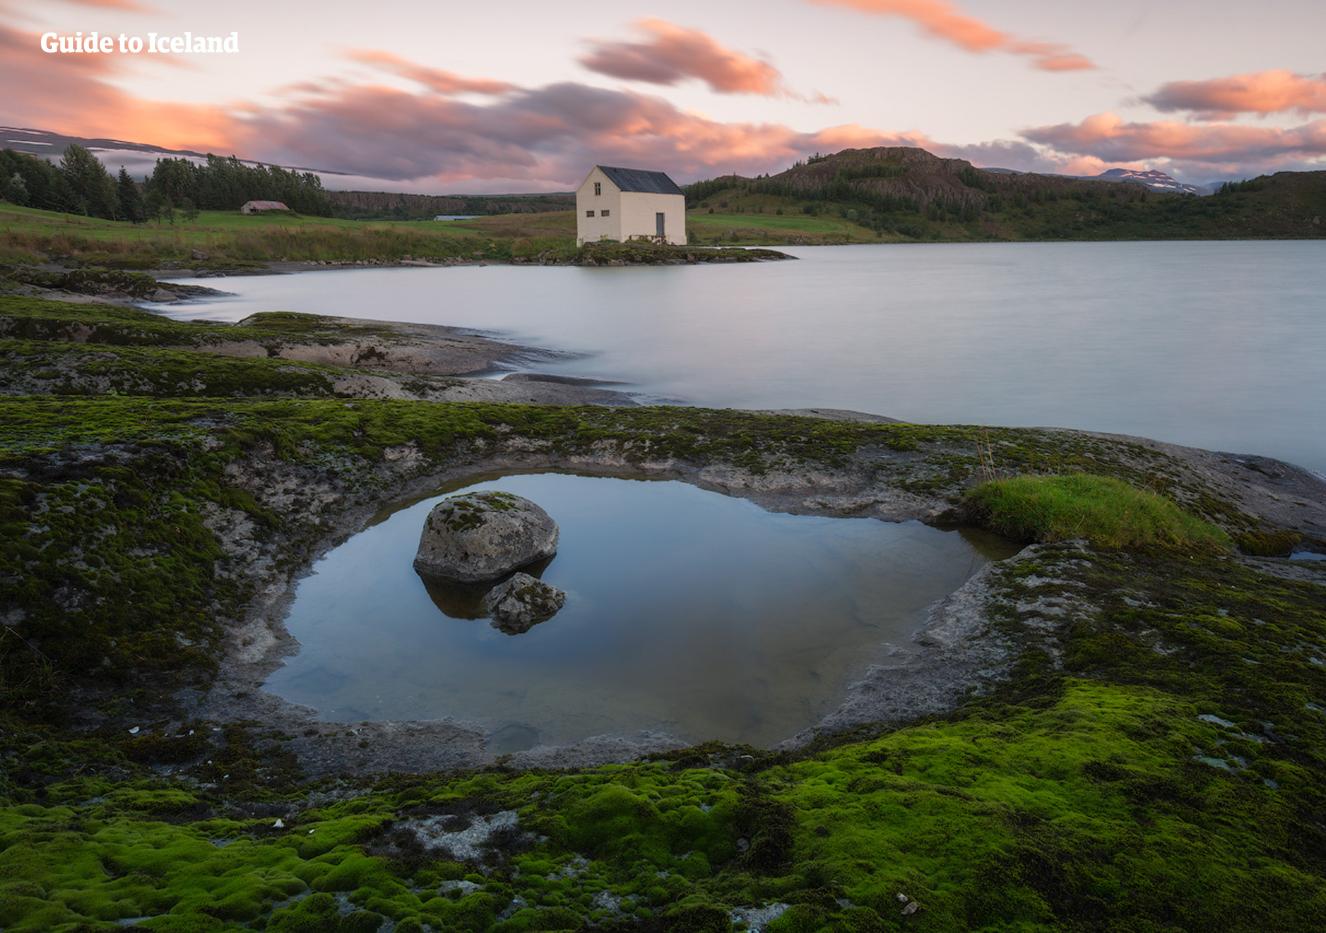 The lake Lagarfljót can be found in Iceland's Eastfjords near Egilsstaðir town.